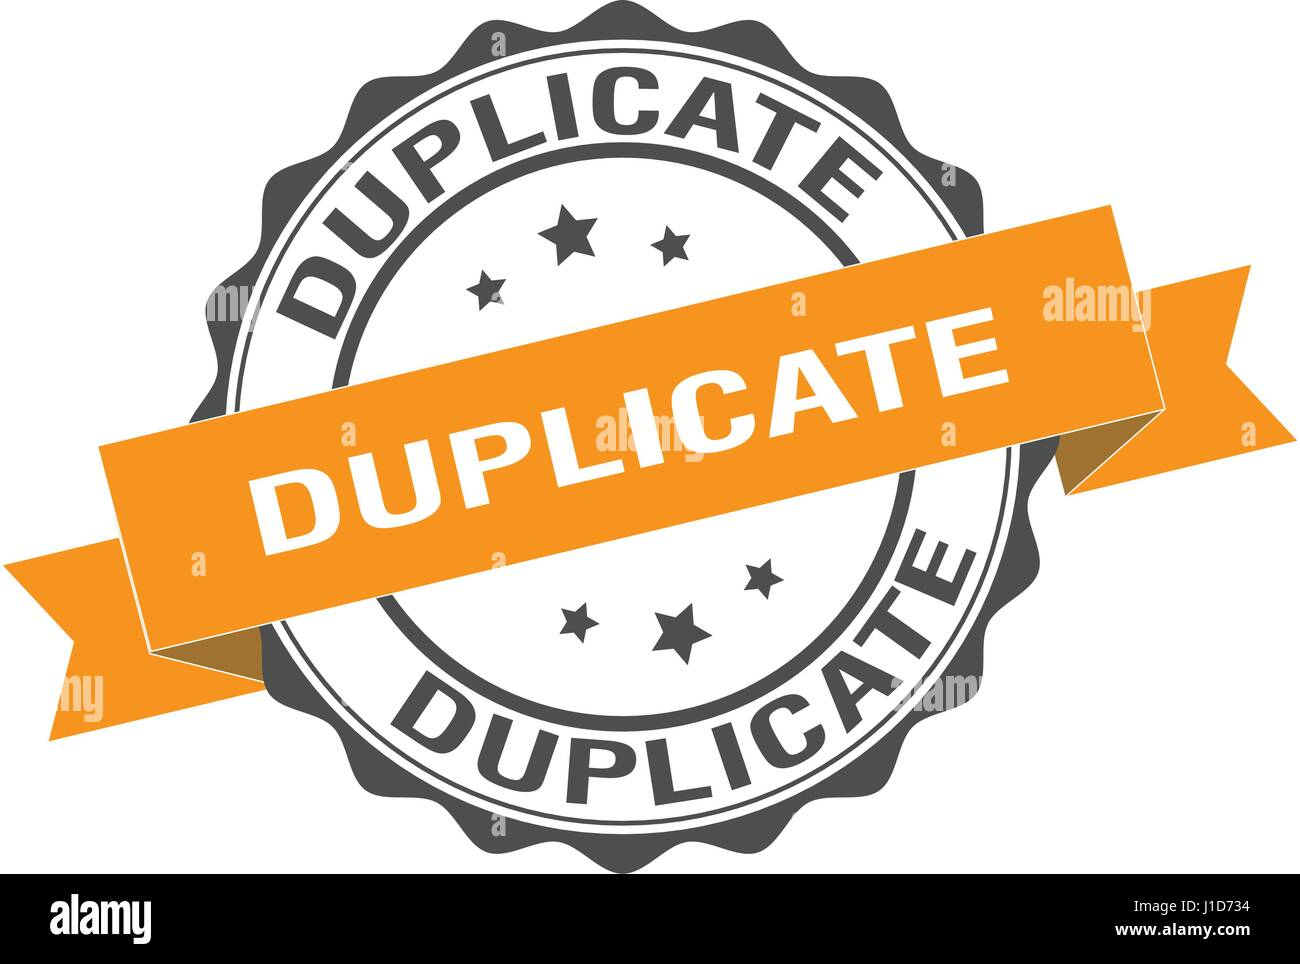 Duplicate stamp illustration - Stock Image